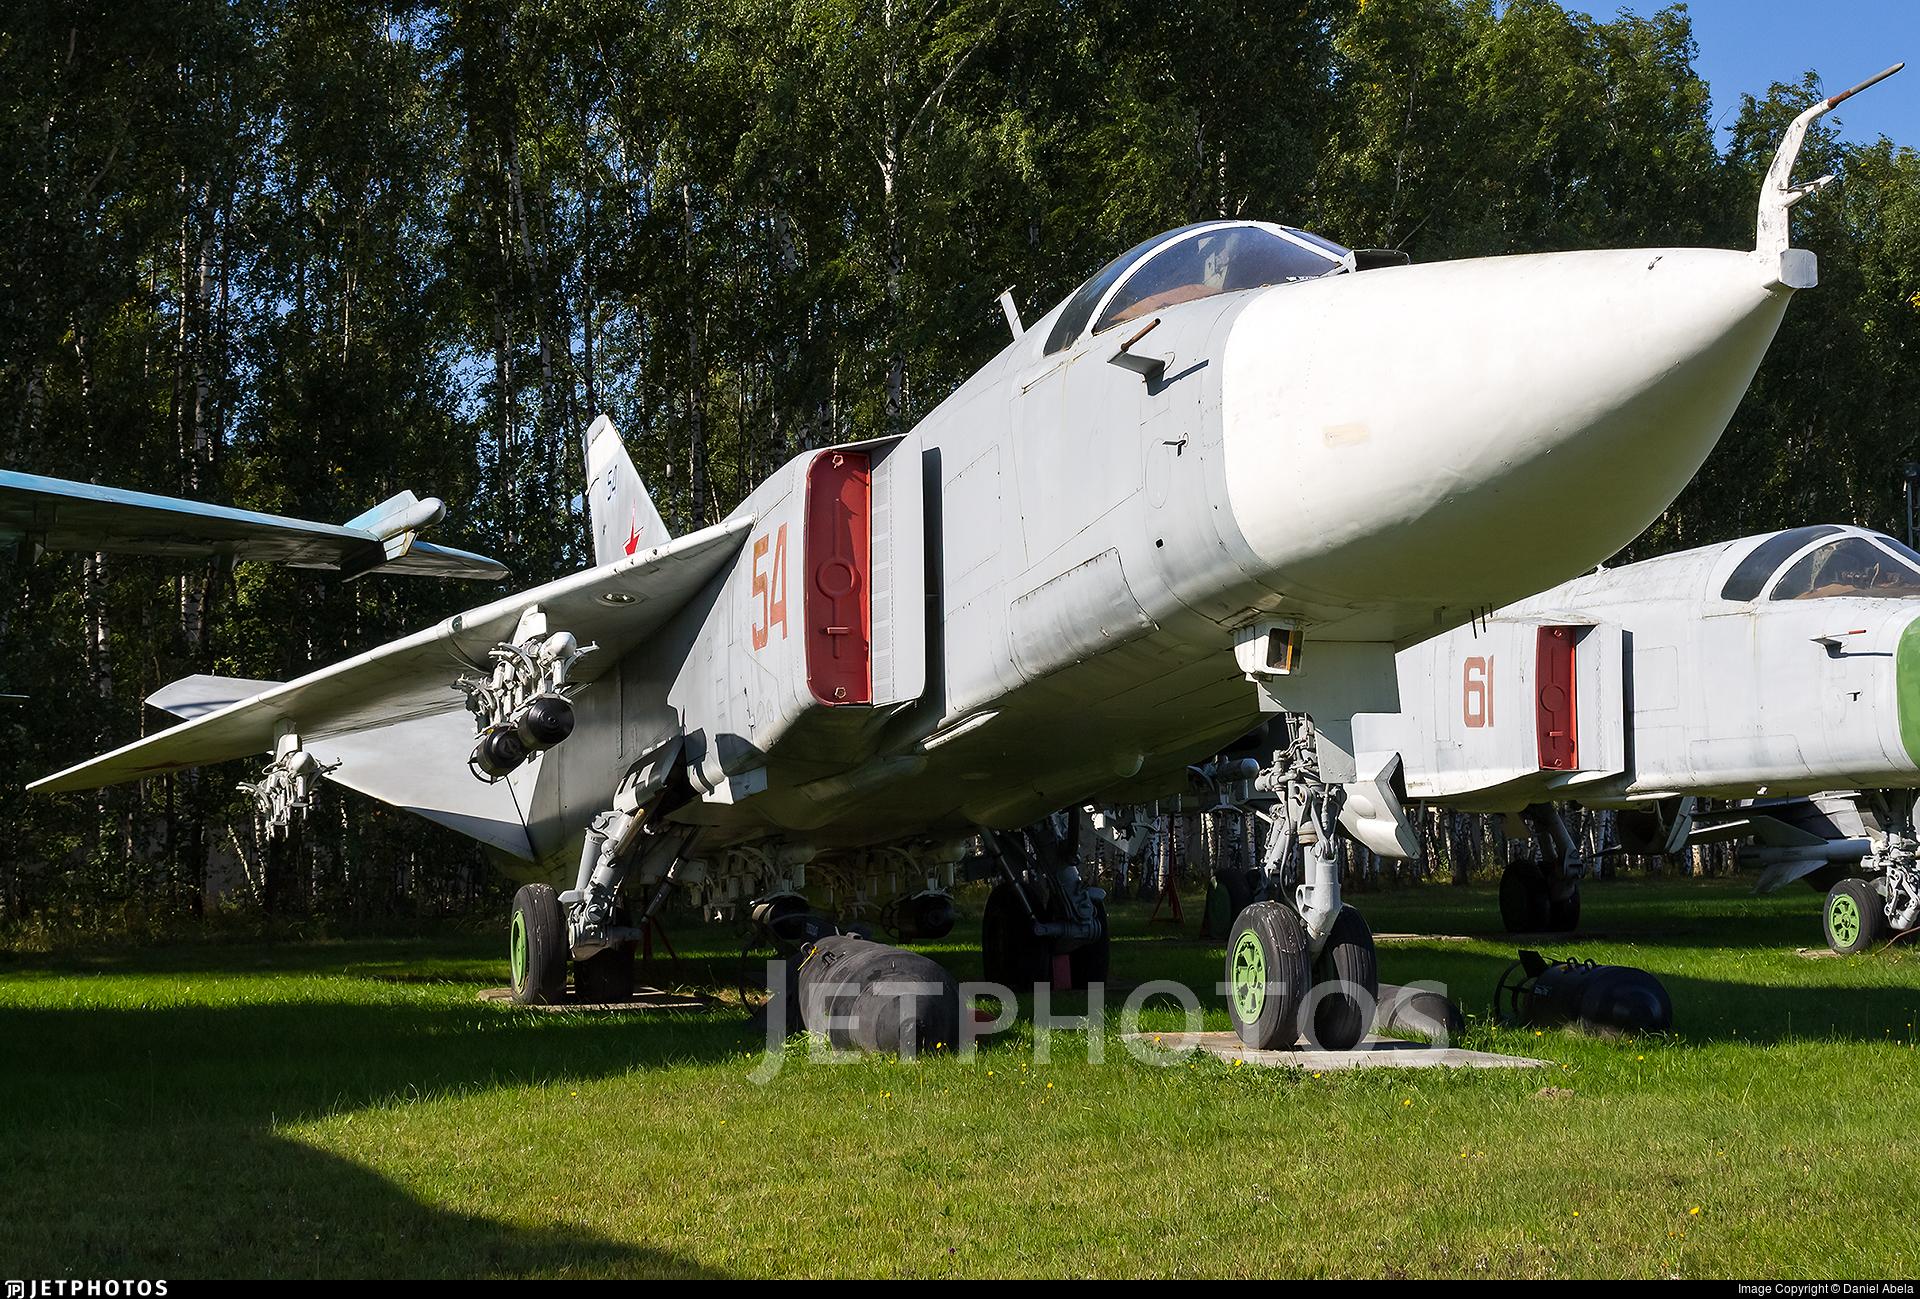 54 - Sukhoi Su-24 Fencer - Soviet Union - Air Force